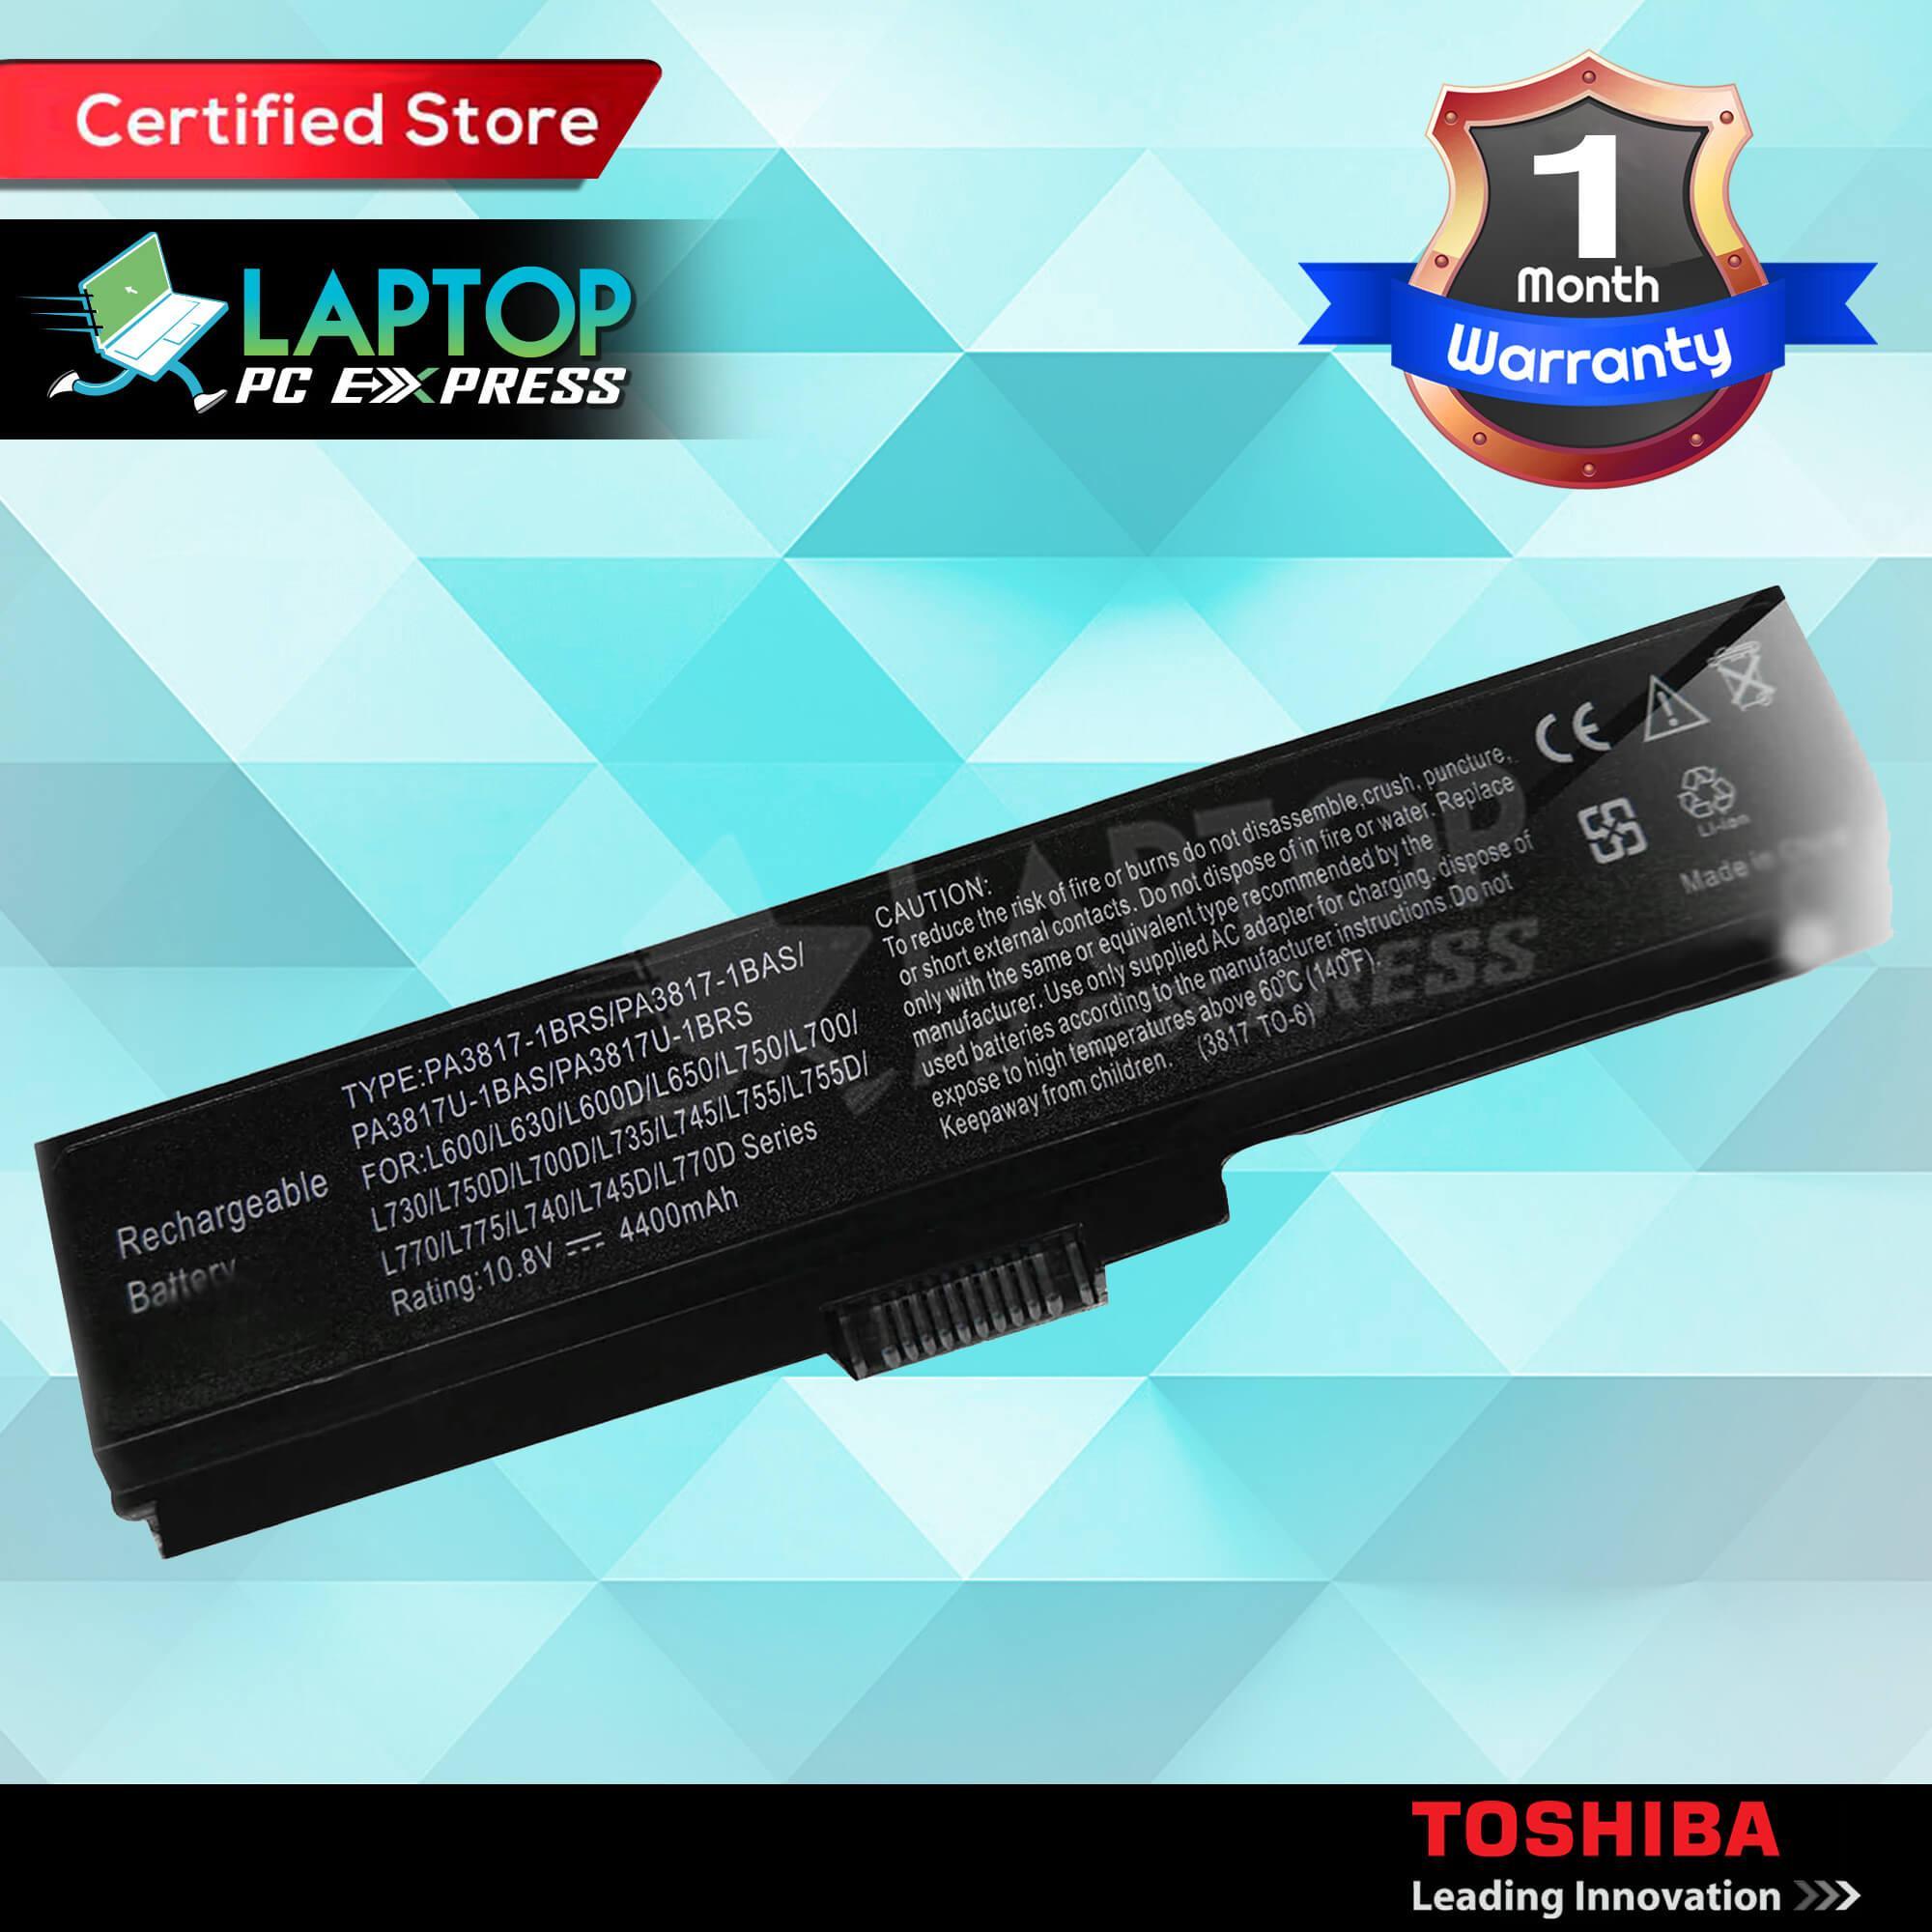 Laptop Battery PA3817U-1BRSfor Toshiba M645 ,P740 P745 , P745D ,P750 ,P755  Series,P755D Series,P770 Series, P775 Series,P775D Series, Pro C650 Series,